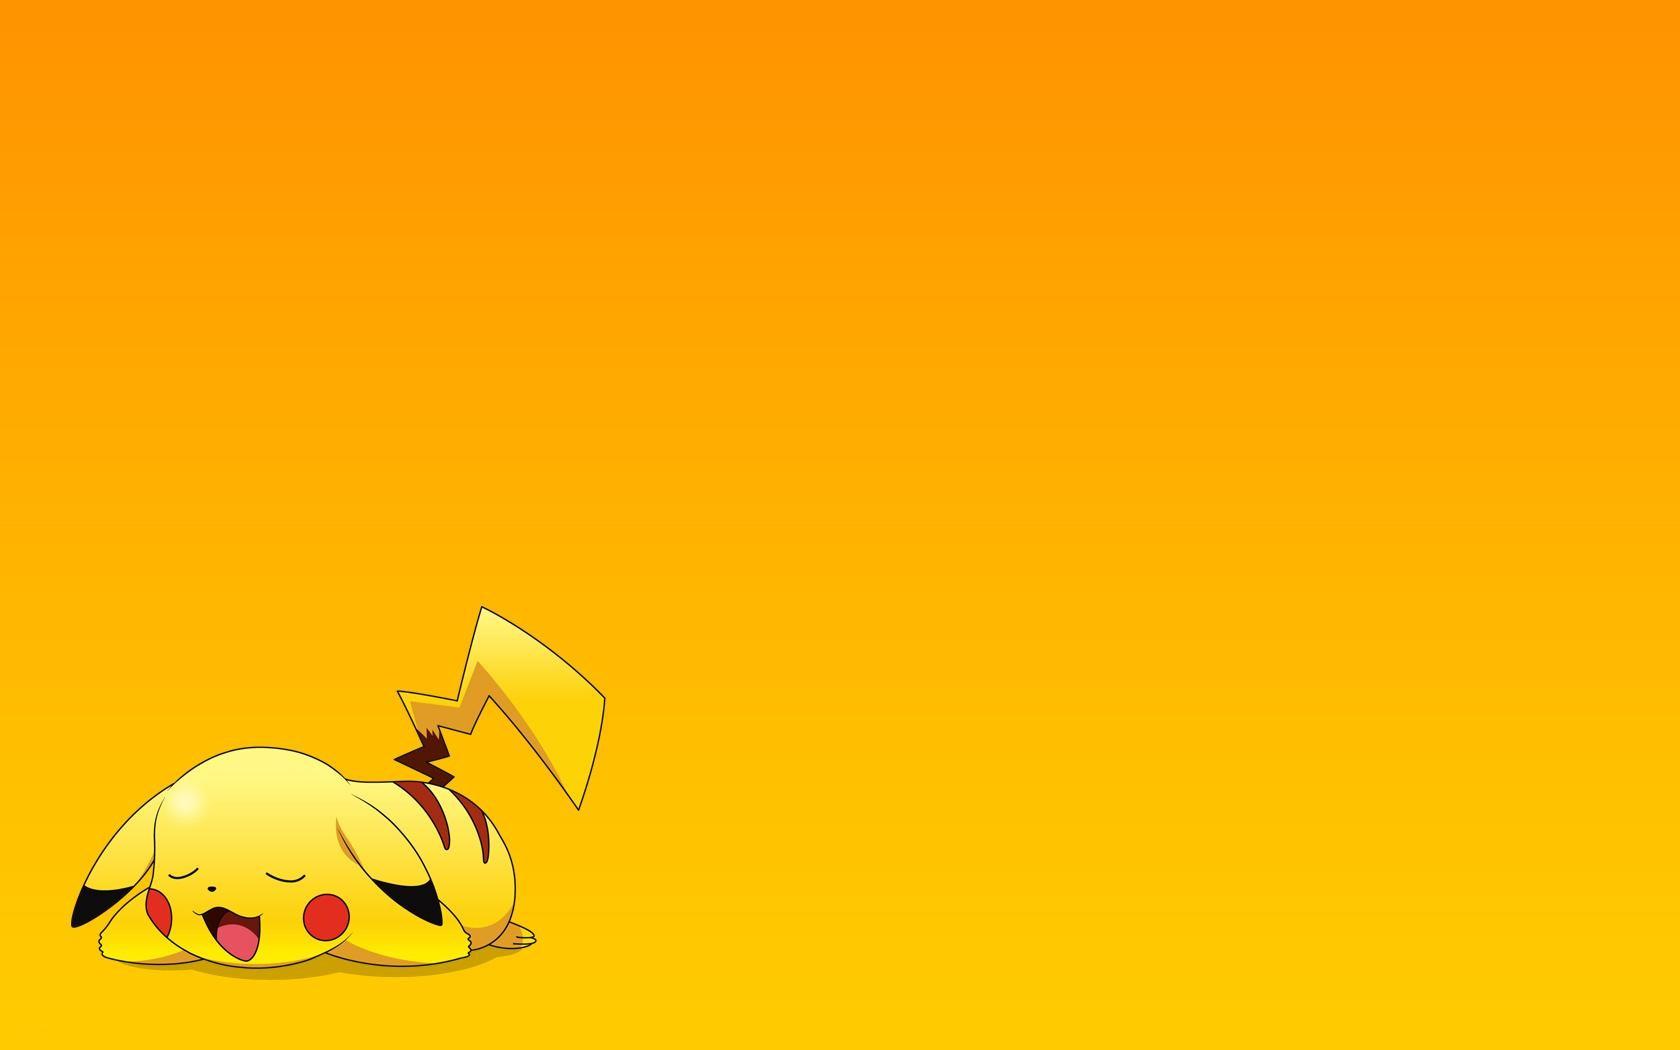 General 1680x1050 simple background yellow background Pokémon Pikachu anime gradient